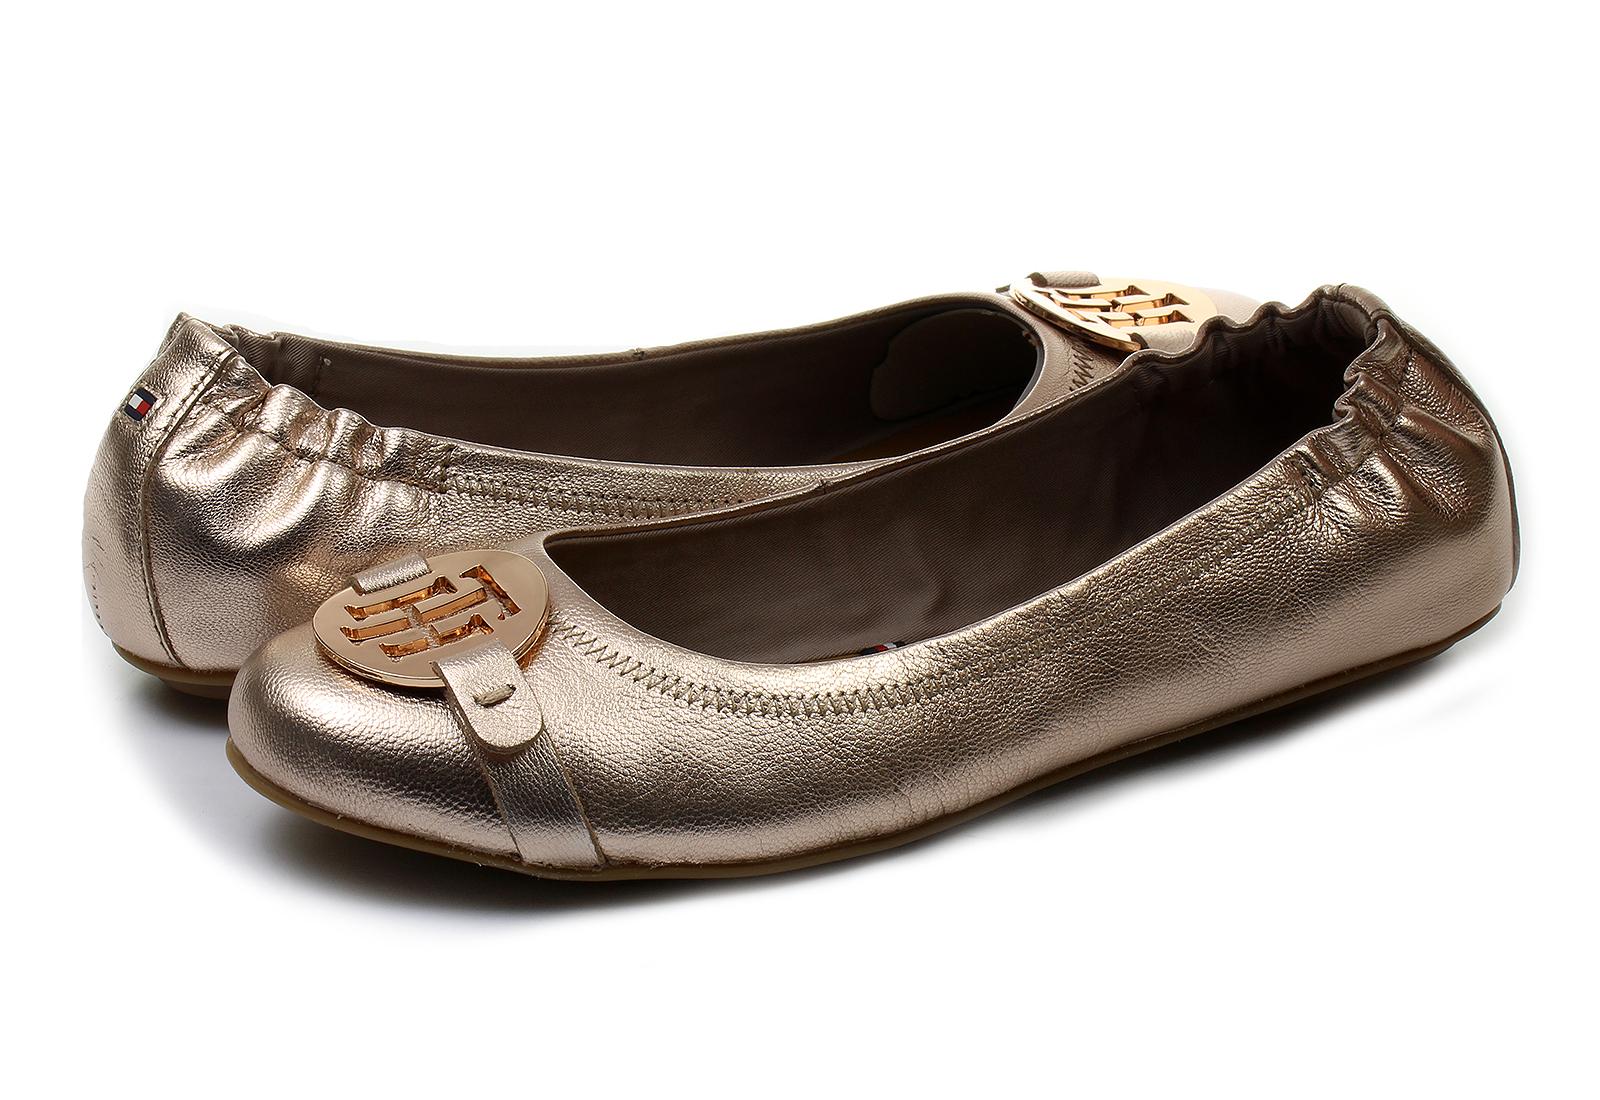 Tommy Hilfiger Ballerinas - Appleton 9z - 17S-1016-703 - Online shop ... 0e0fff8a929